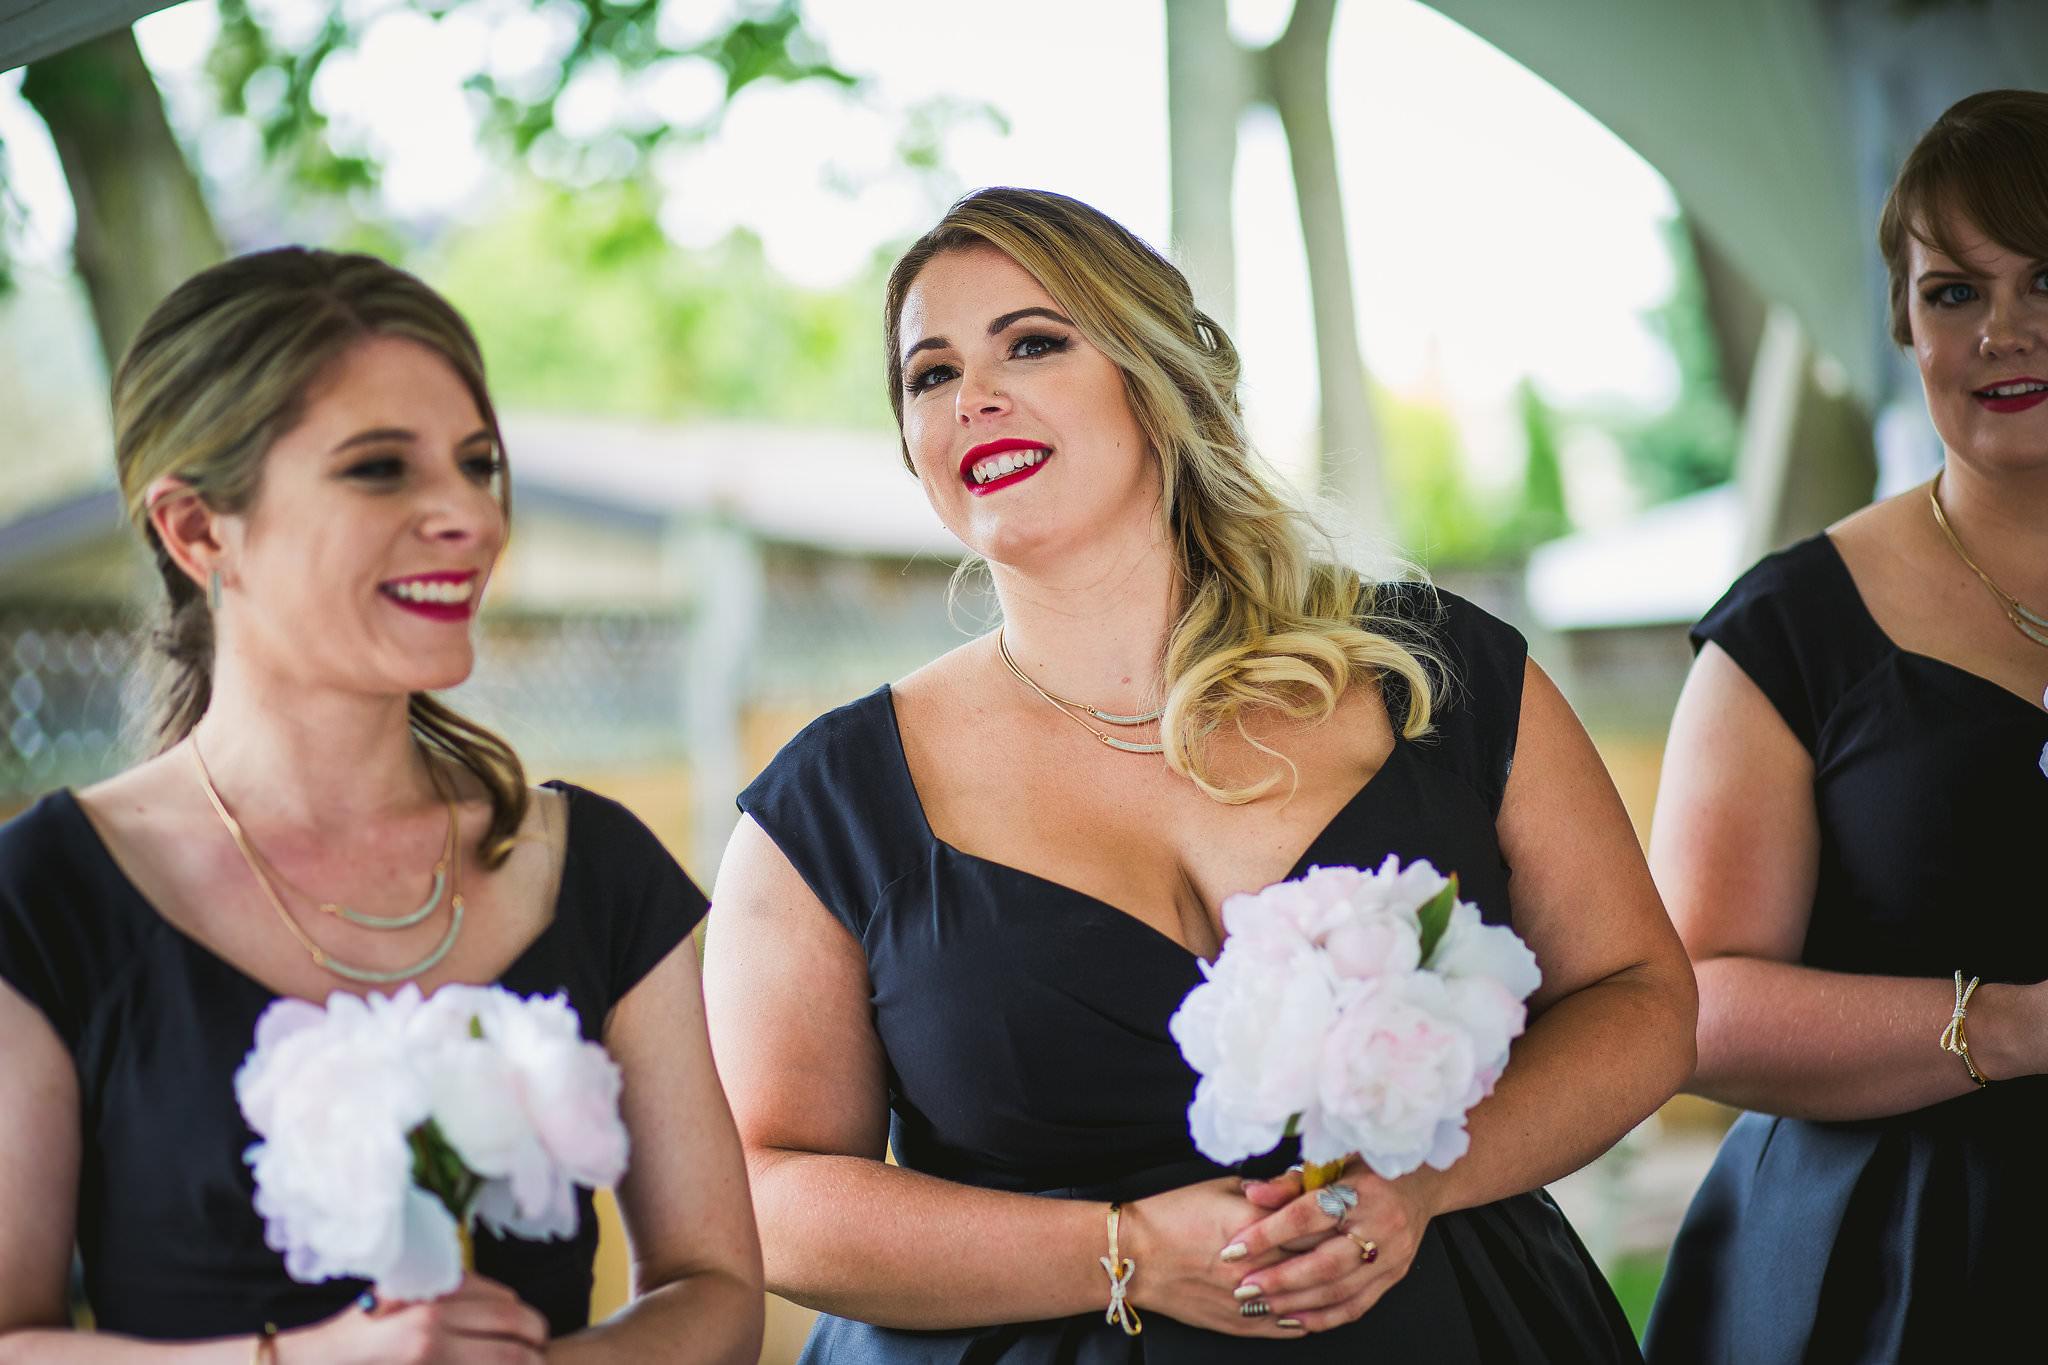 Kristen Adam Kindred Loft Whitby Wedding Photos 148 - Durham Wedding Photographer: Kindred Loft Wedding Photos